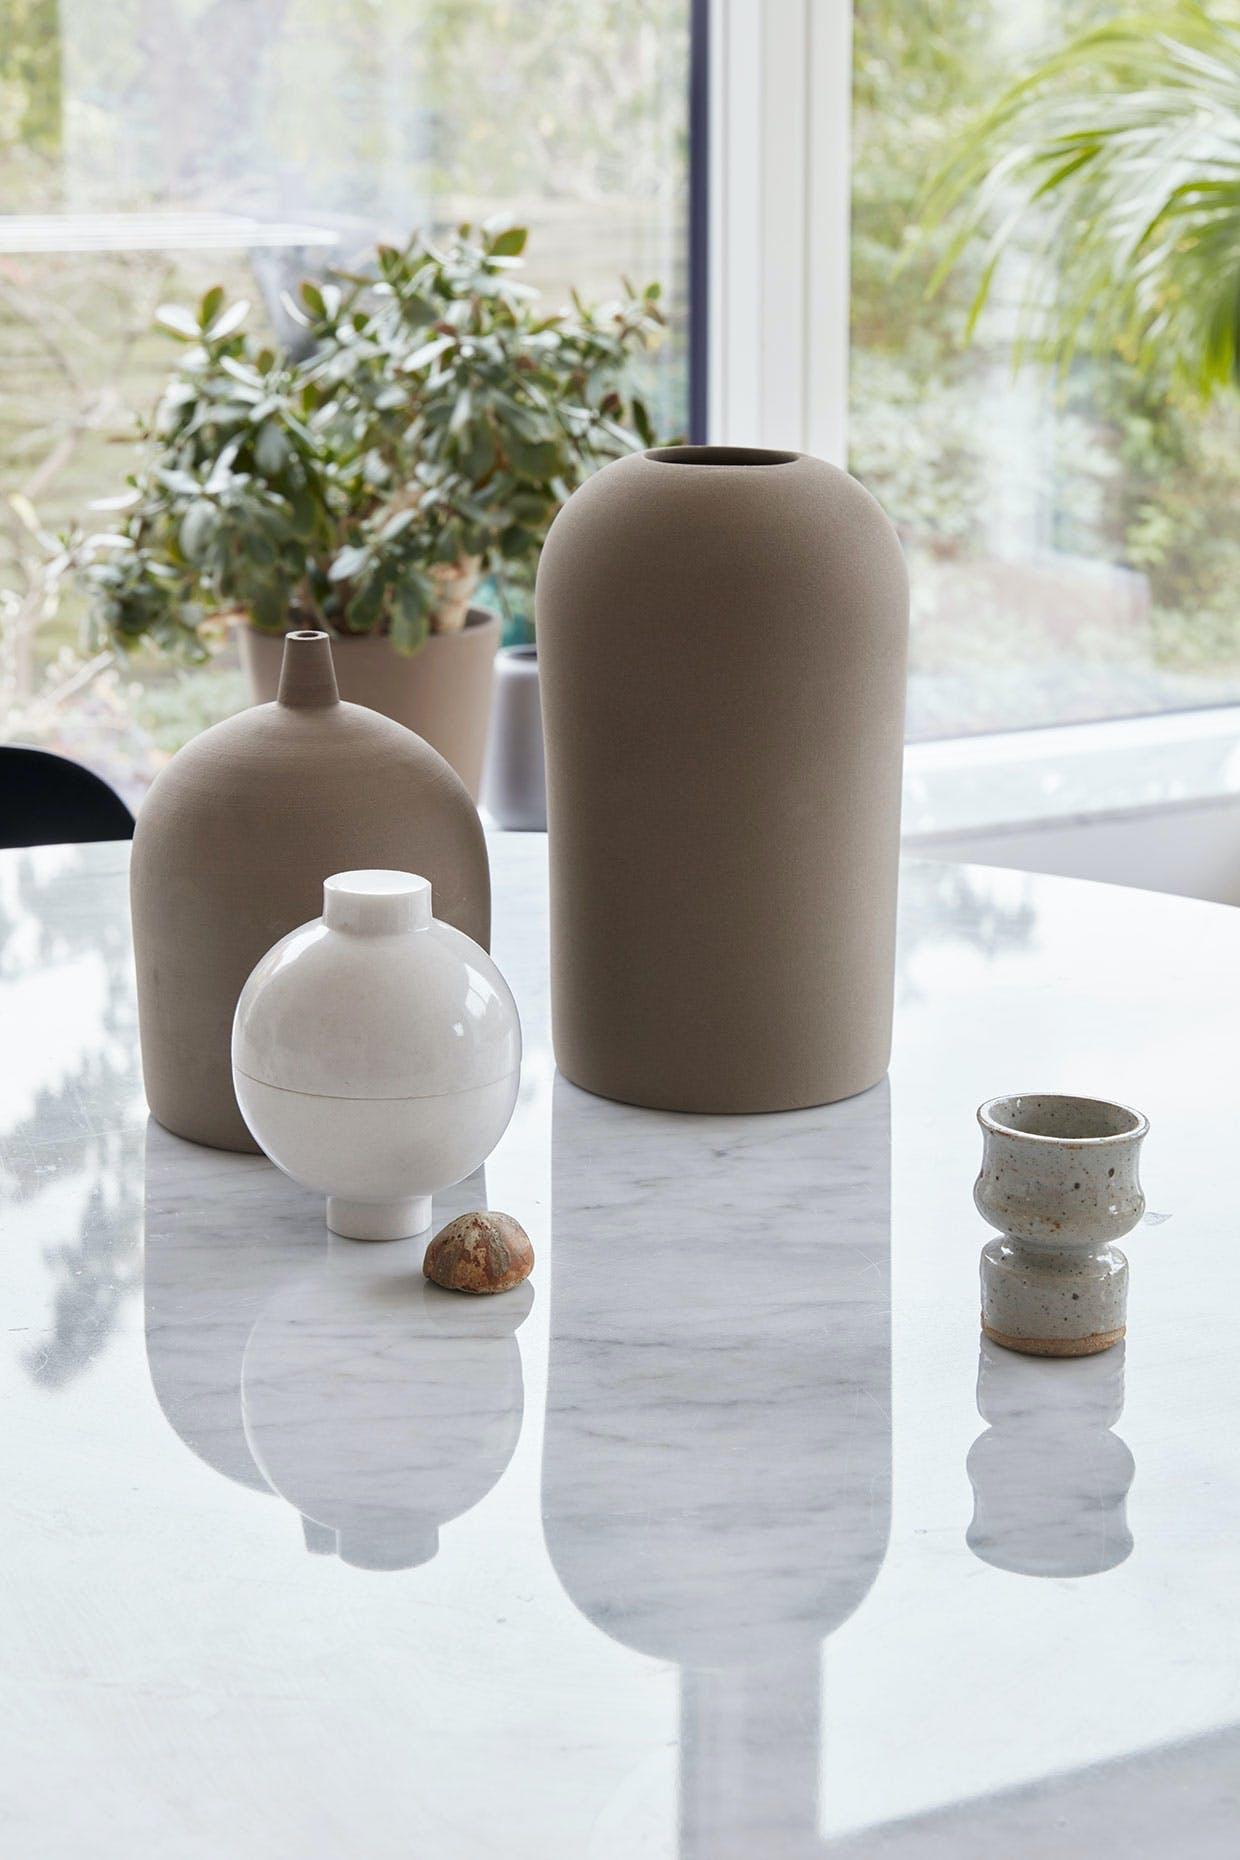 kristina dam terracotta vase dome vases wooden sphere